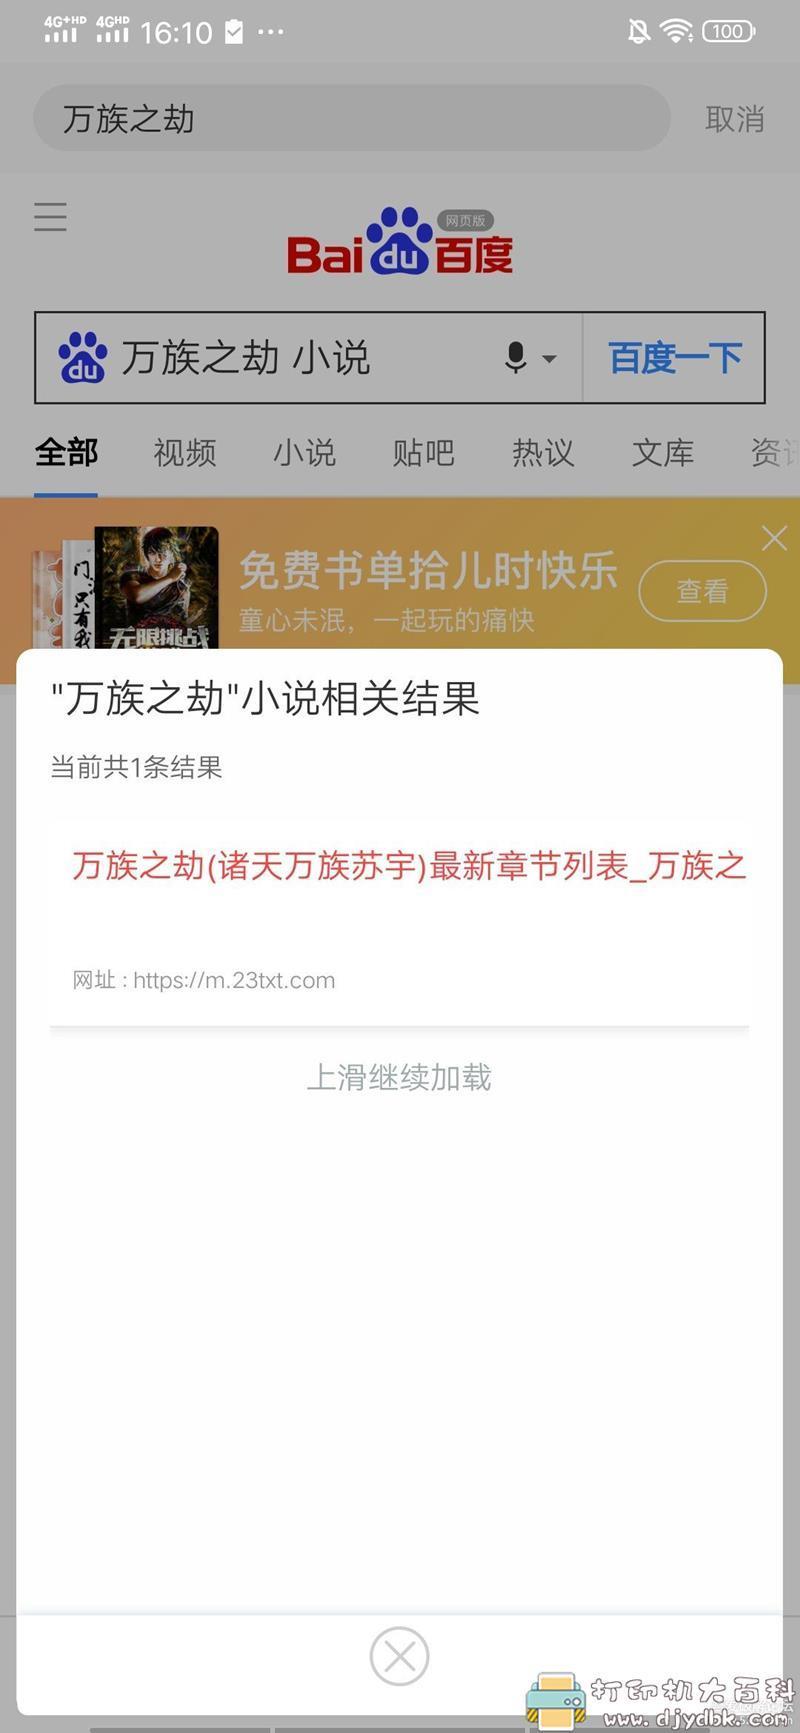 [Android]去搜书1.3.4最新版本,无广告可选源图片 No.2